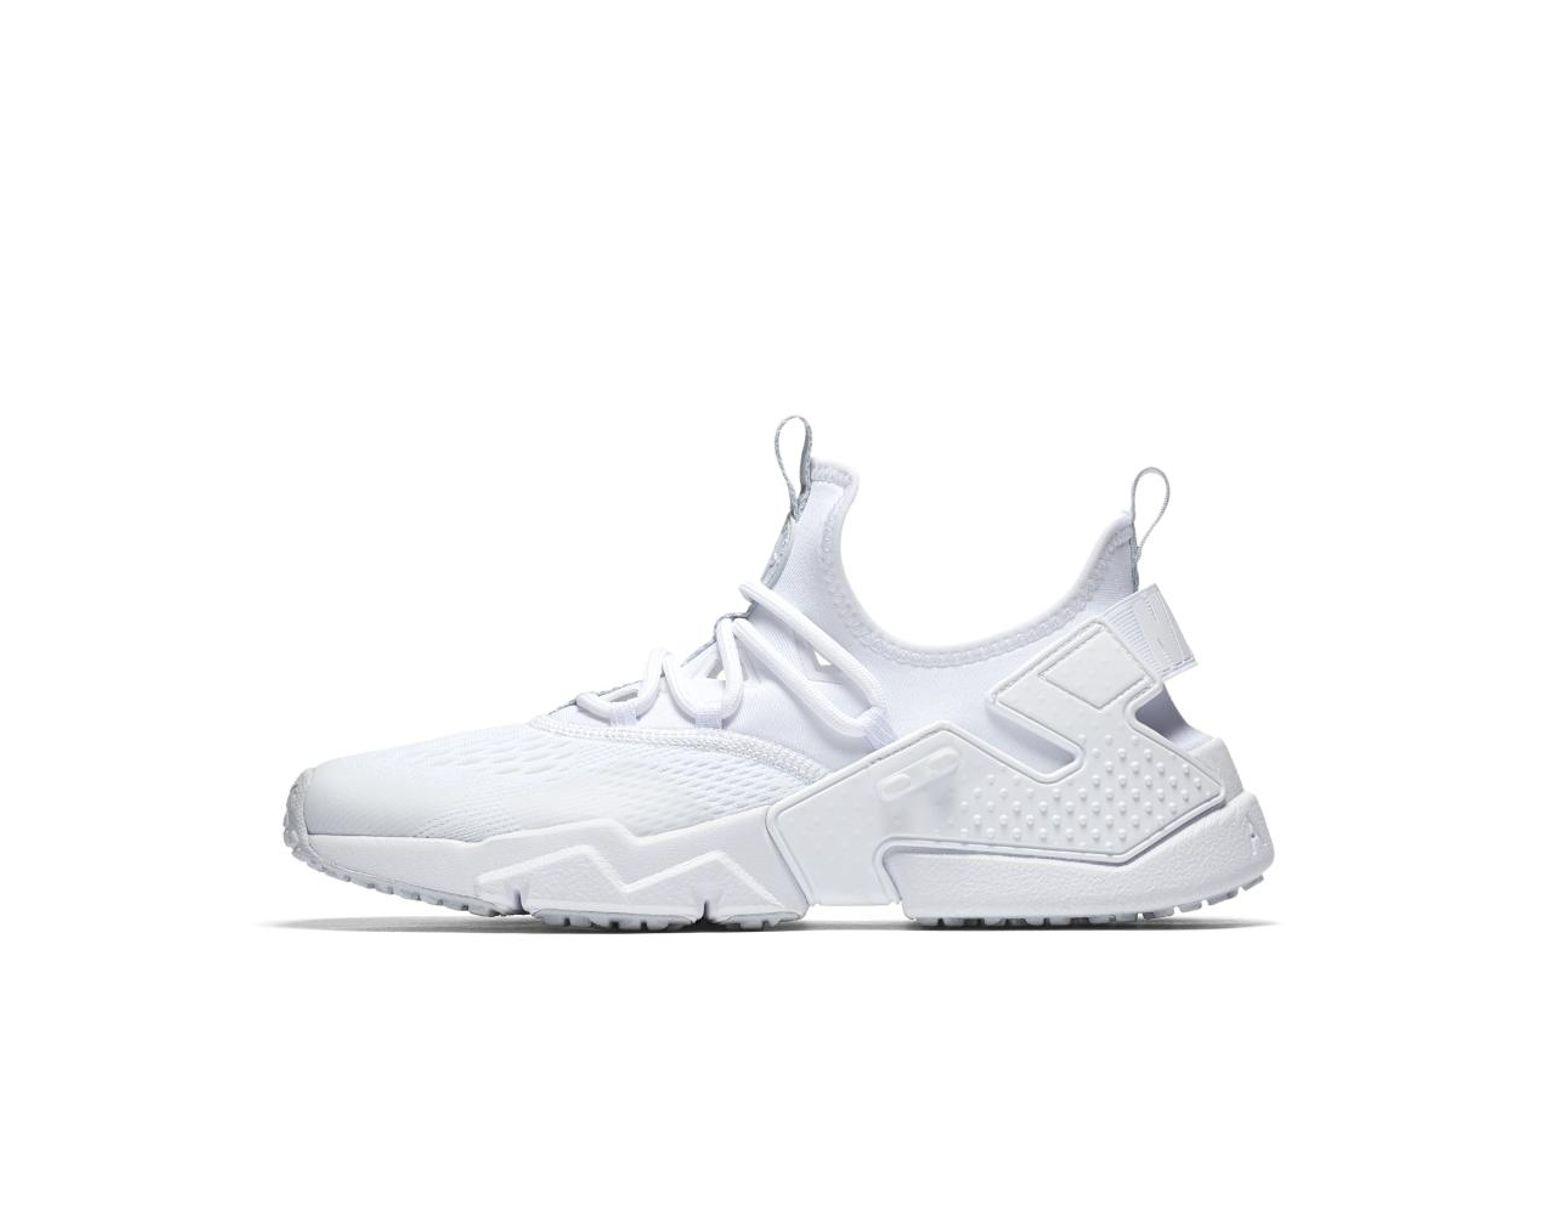 fa7c562938a0 Lyst - Nike Air Huarache Drift Breathe Men s Shoe in White for Men